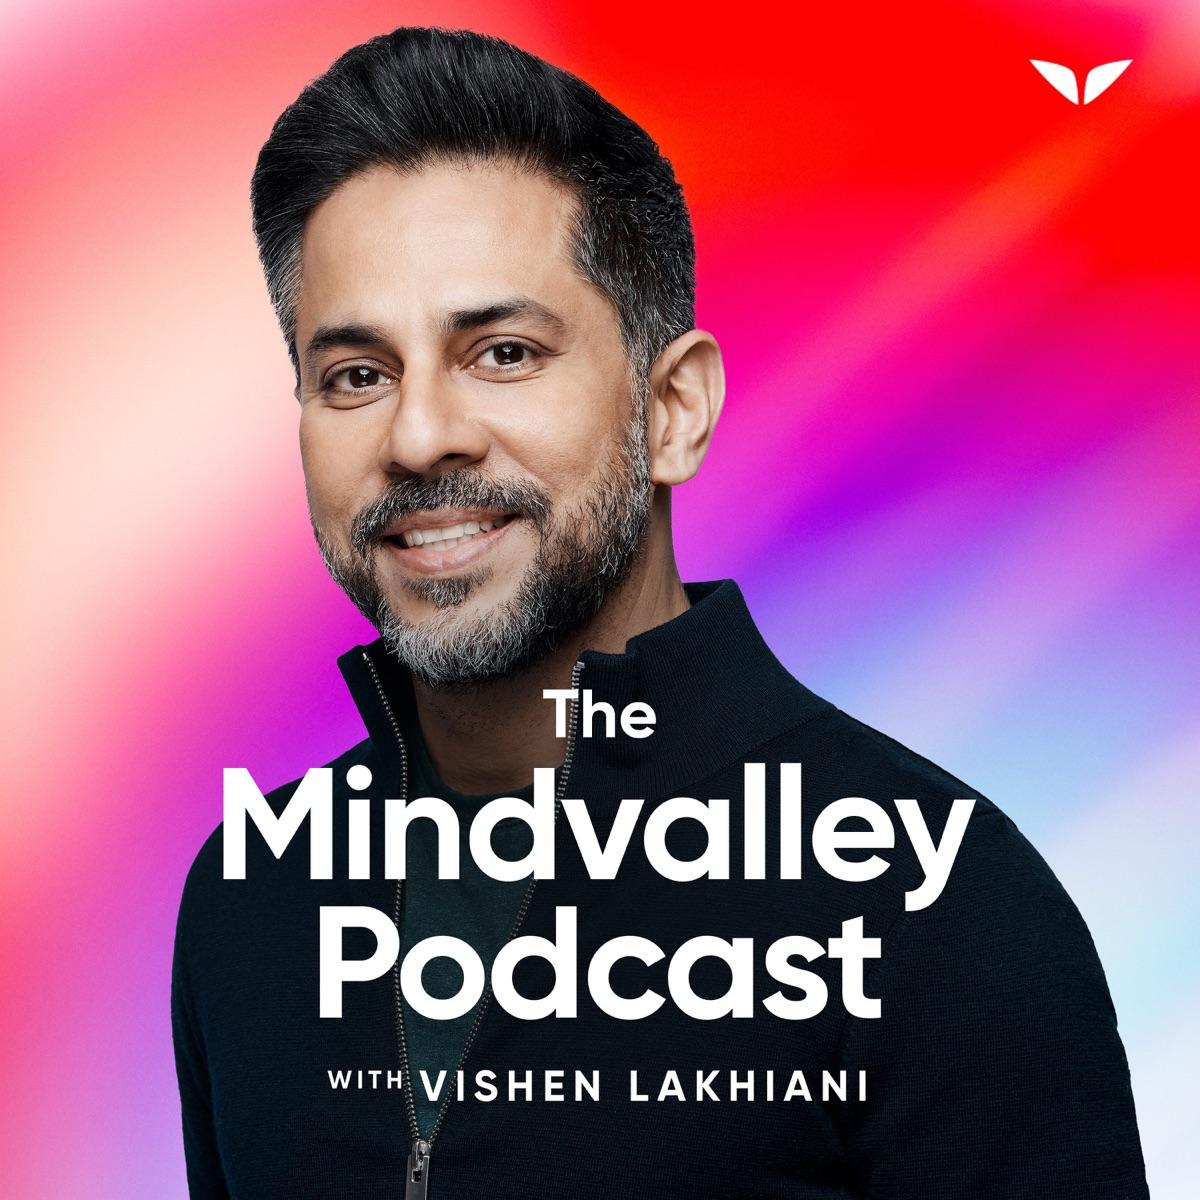 The Mindvalley Podcast with Vishen Lakhiani